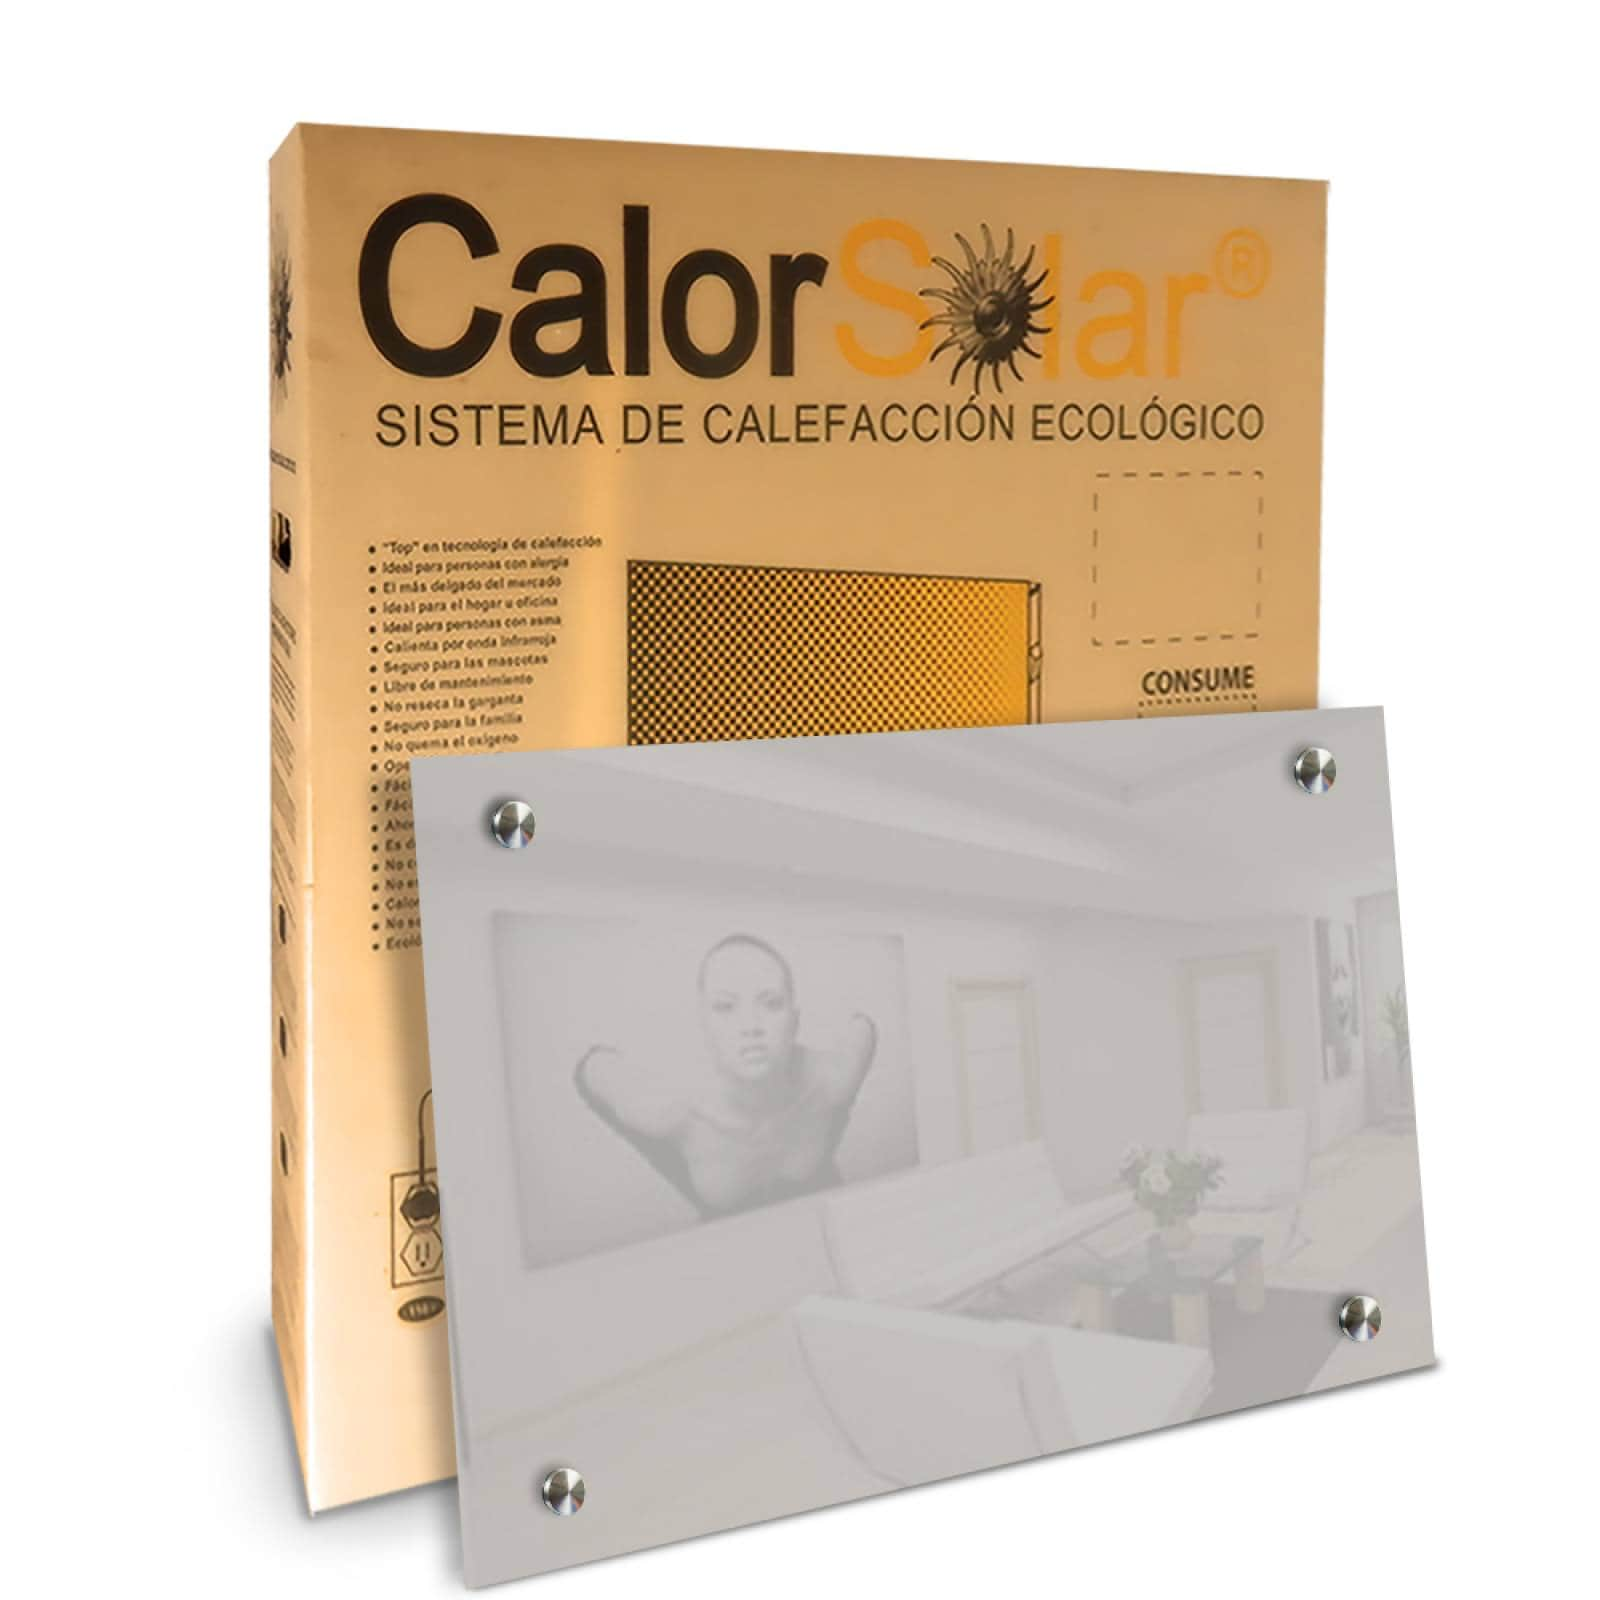 Calefactor de Panel infrarrojo en Cristal para Techo, Arizona Wave White Star de 660W 60x90cm, Mod: 343CaSol-TB4